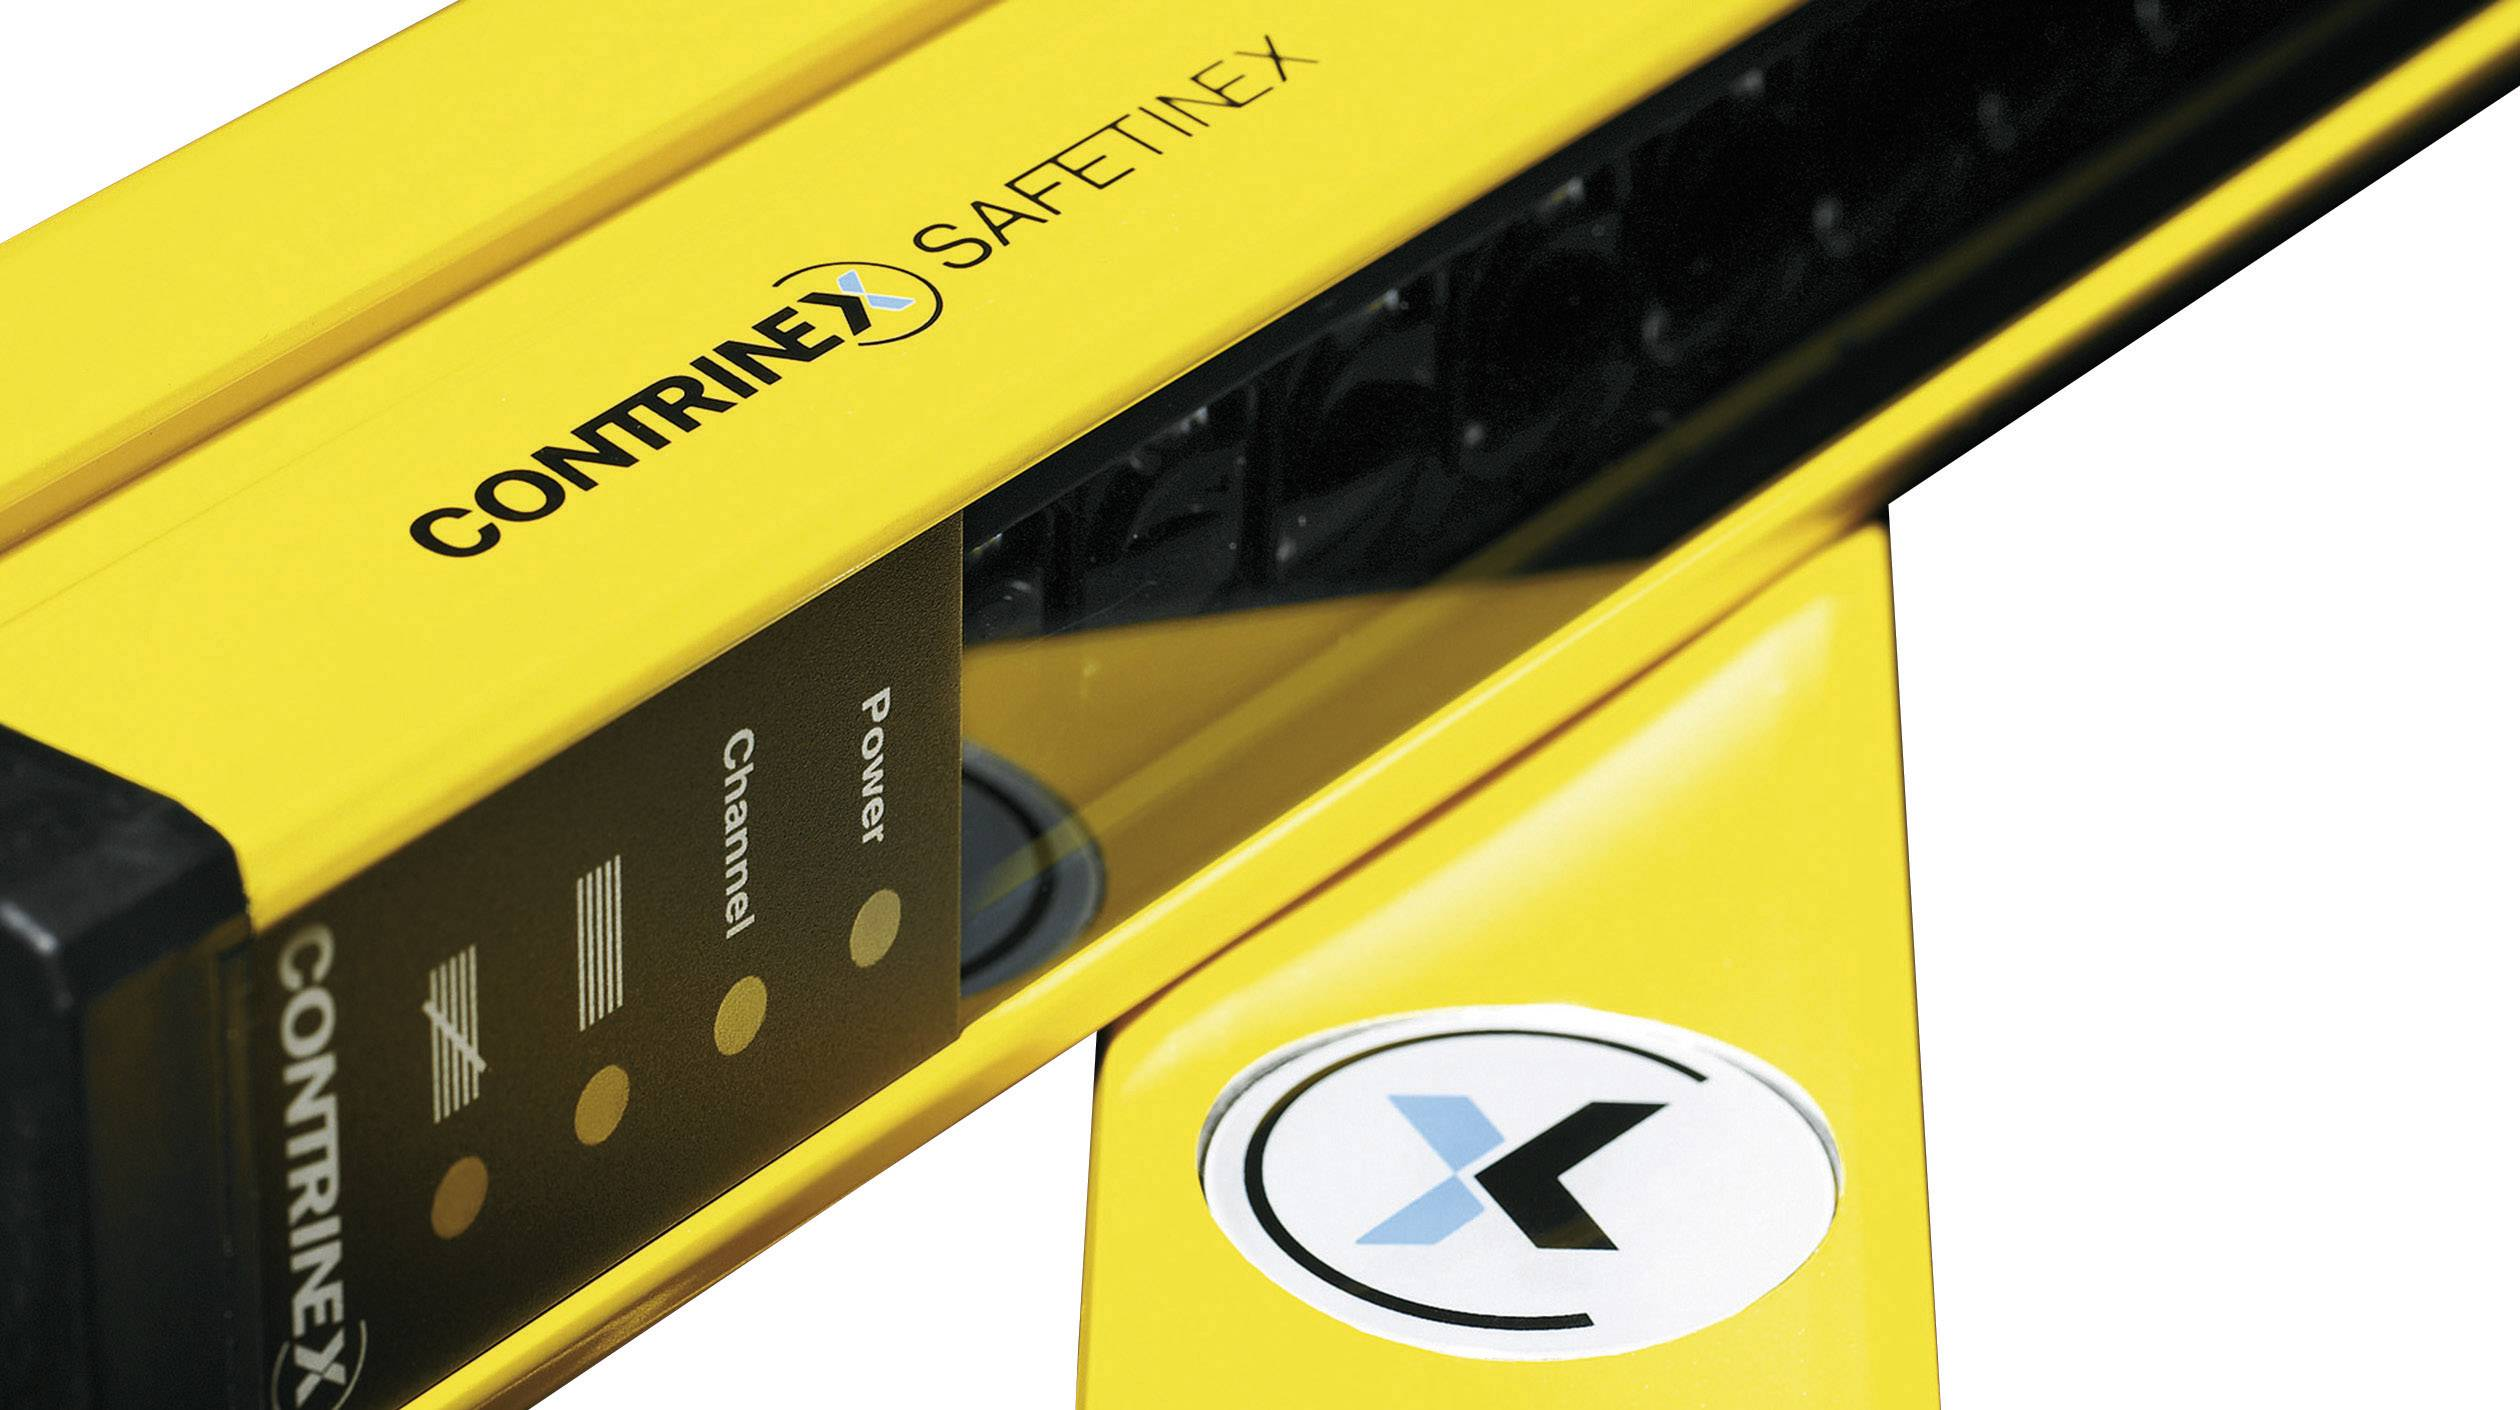 Contrinex YCA-50R4-4400-G012 630 100 050